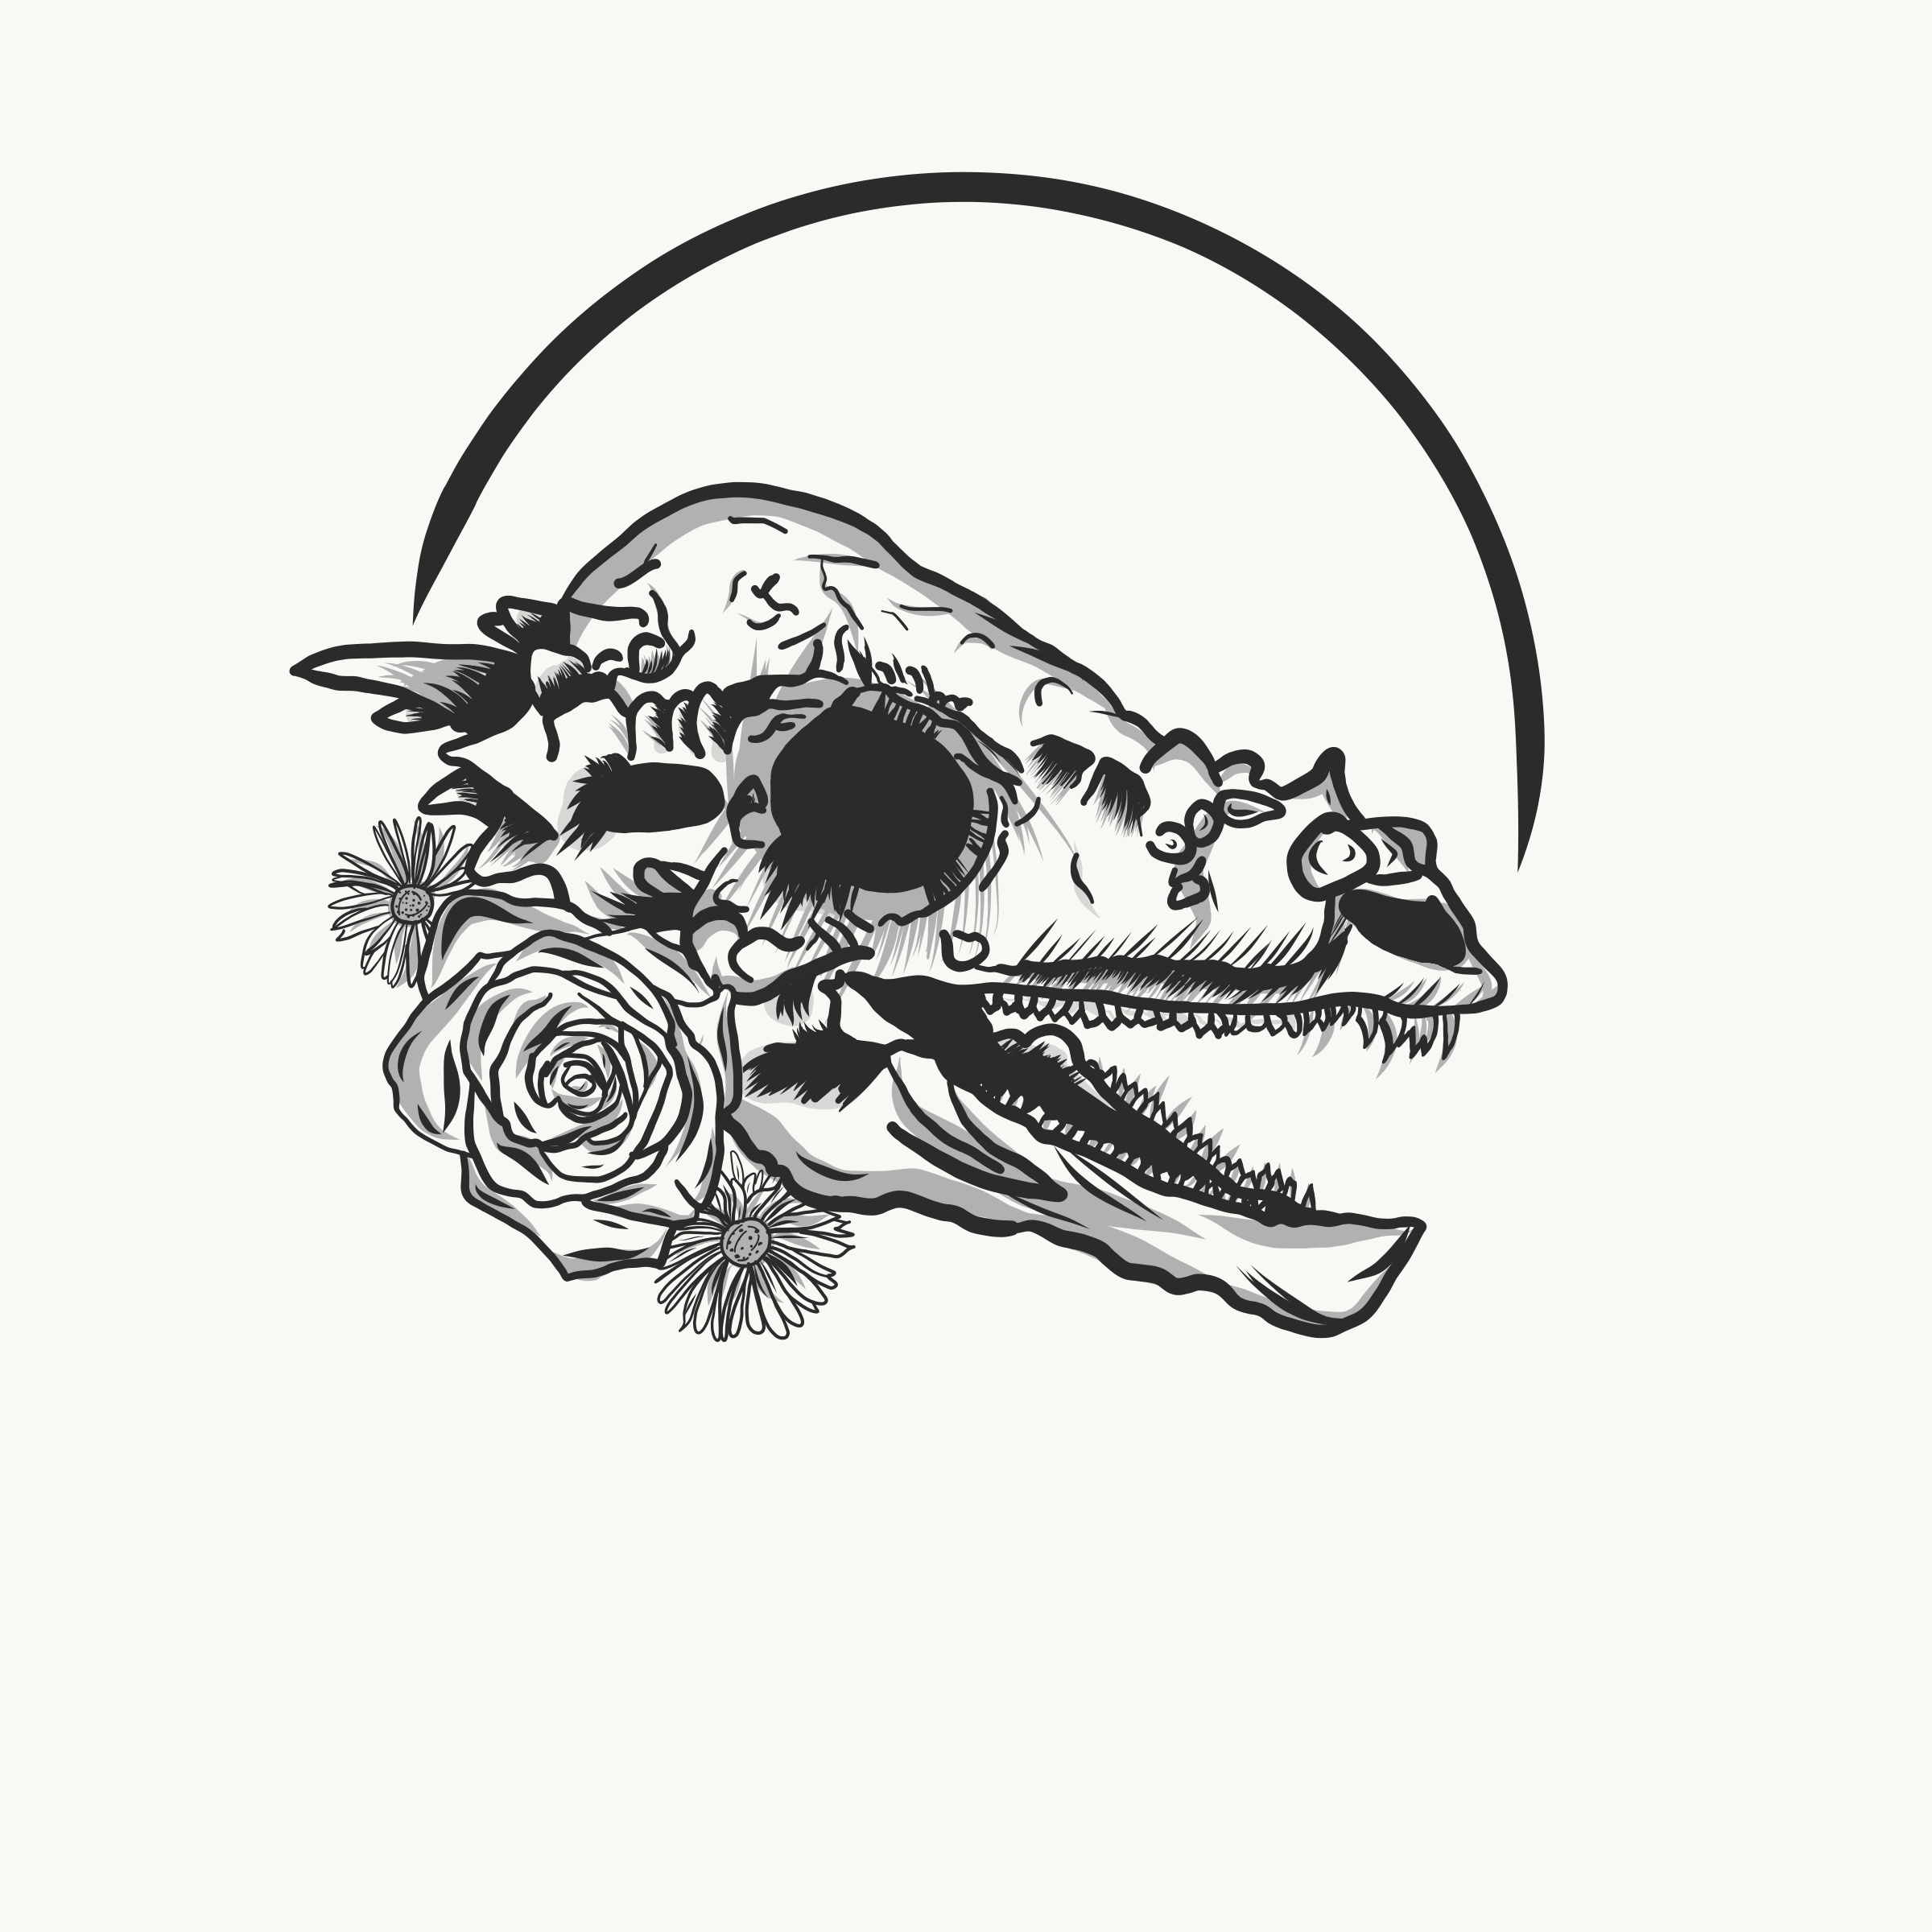 Pachycephalosaurs skull designed for silk screen printing.